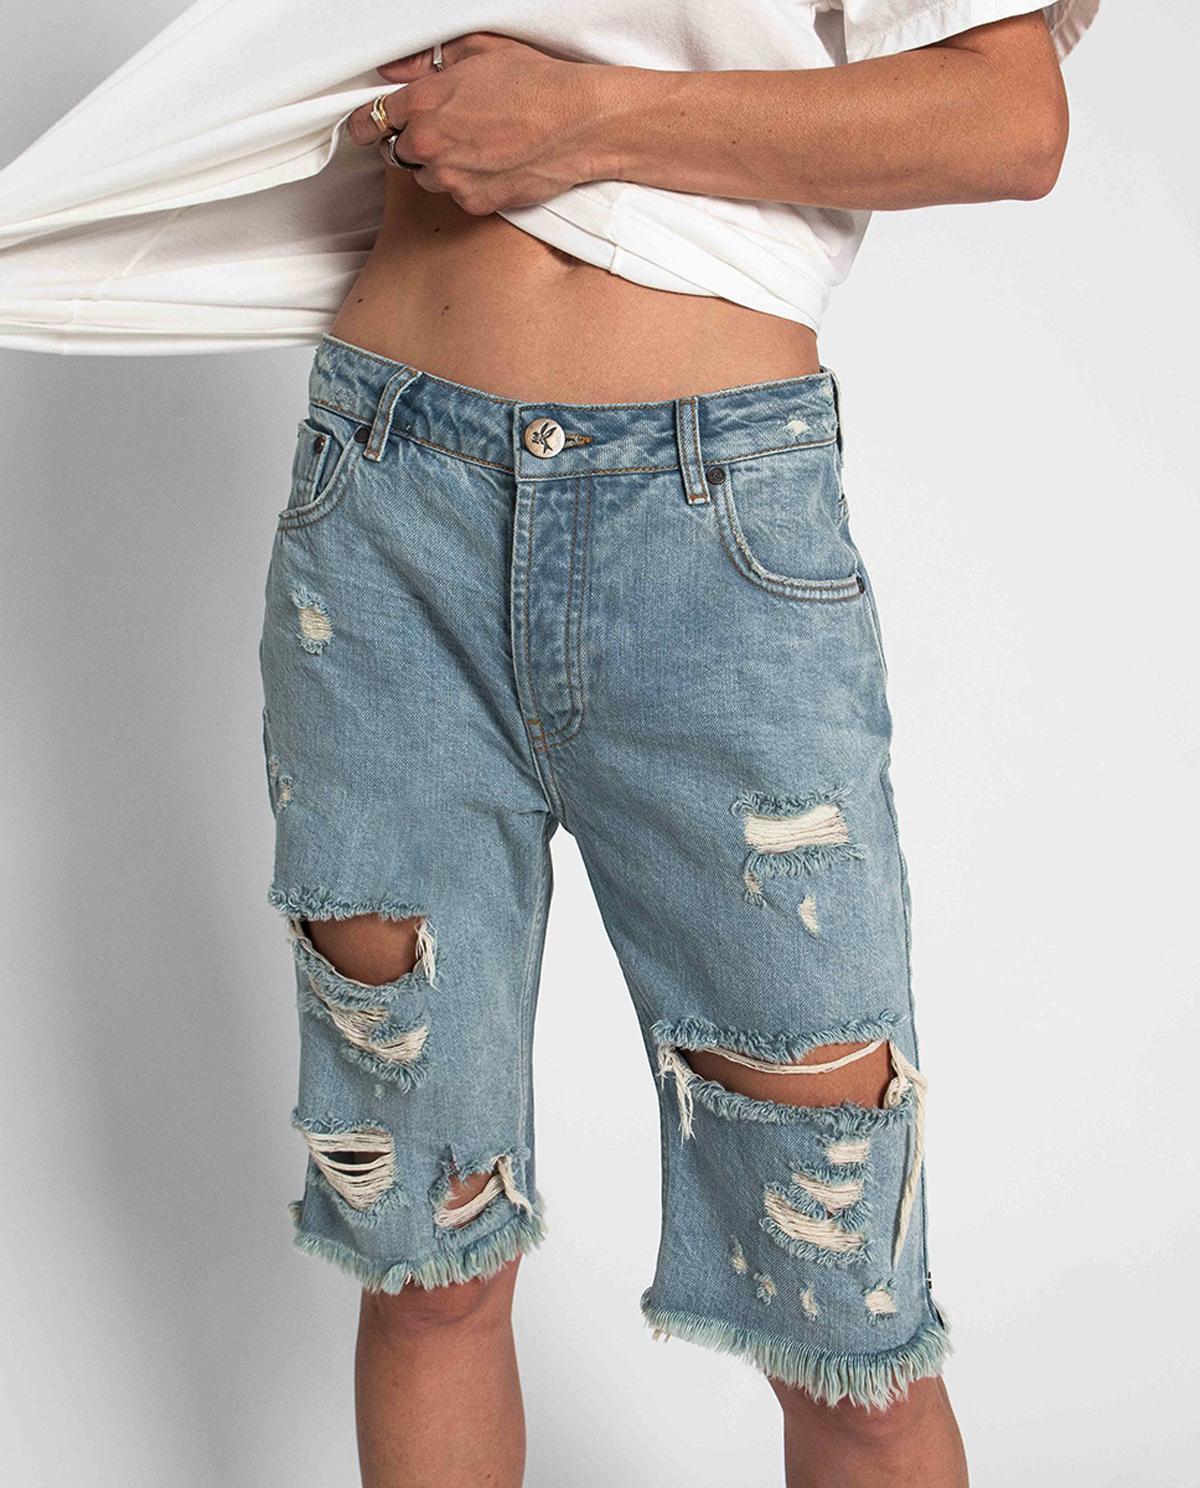 Damskie jeansowe spodenki Kansas Truckers Oneteaspoon 23013 KANSAS